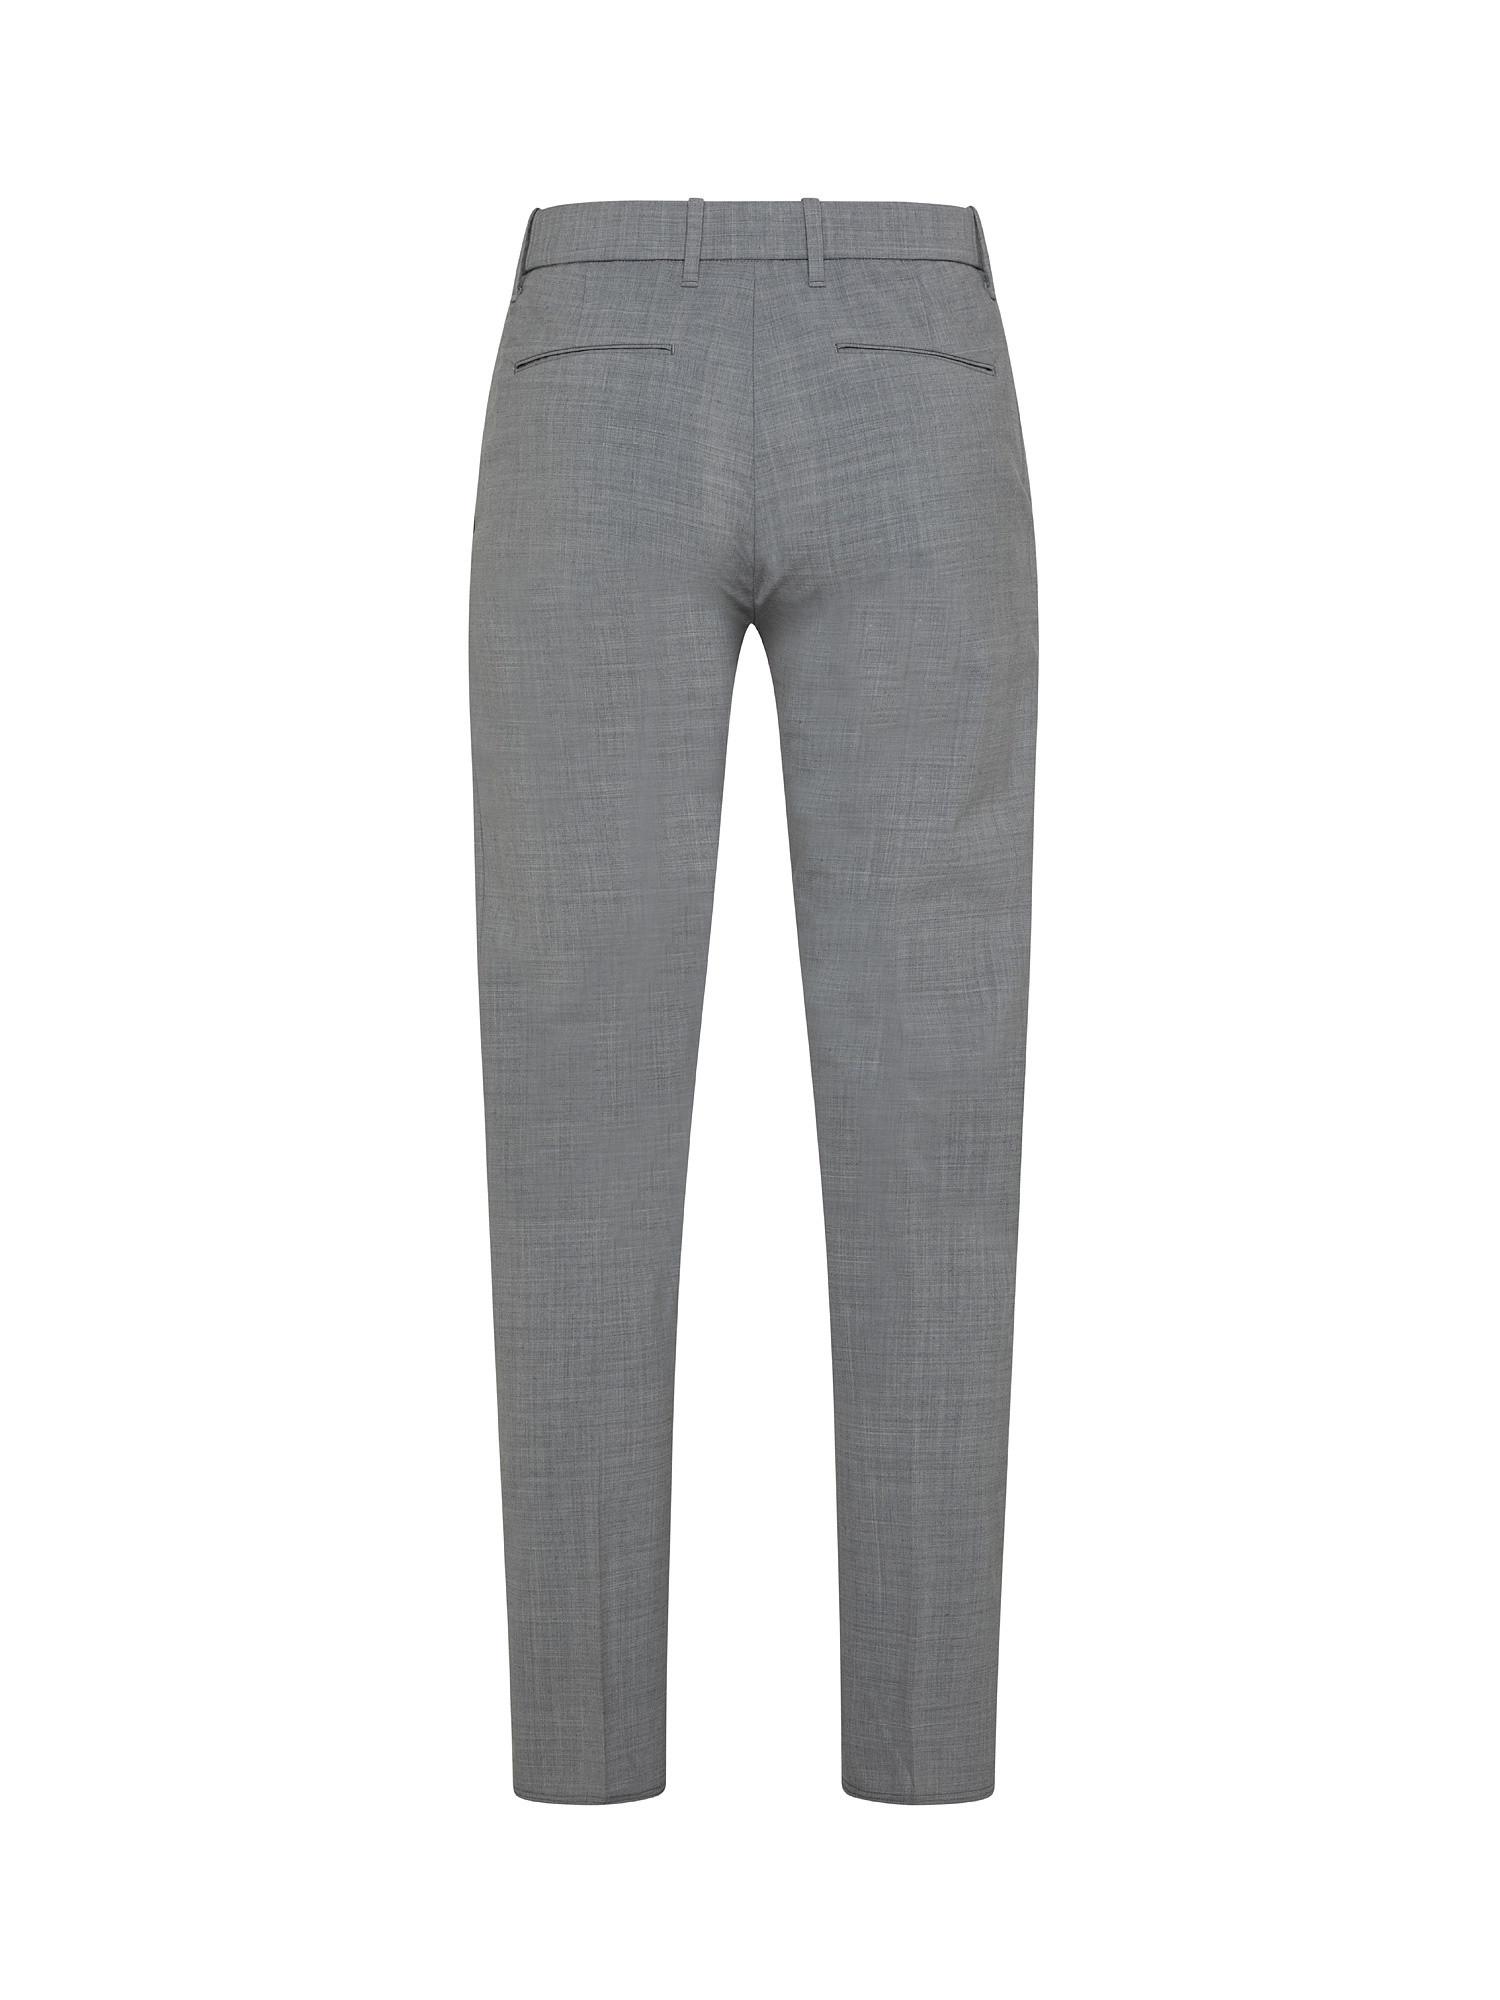 Pantaloni Chino coulisse, Grigio, large image number 1